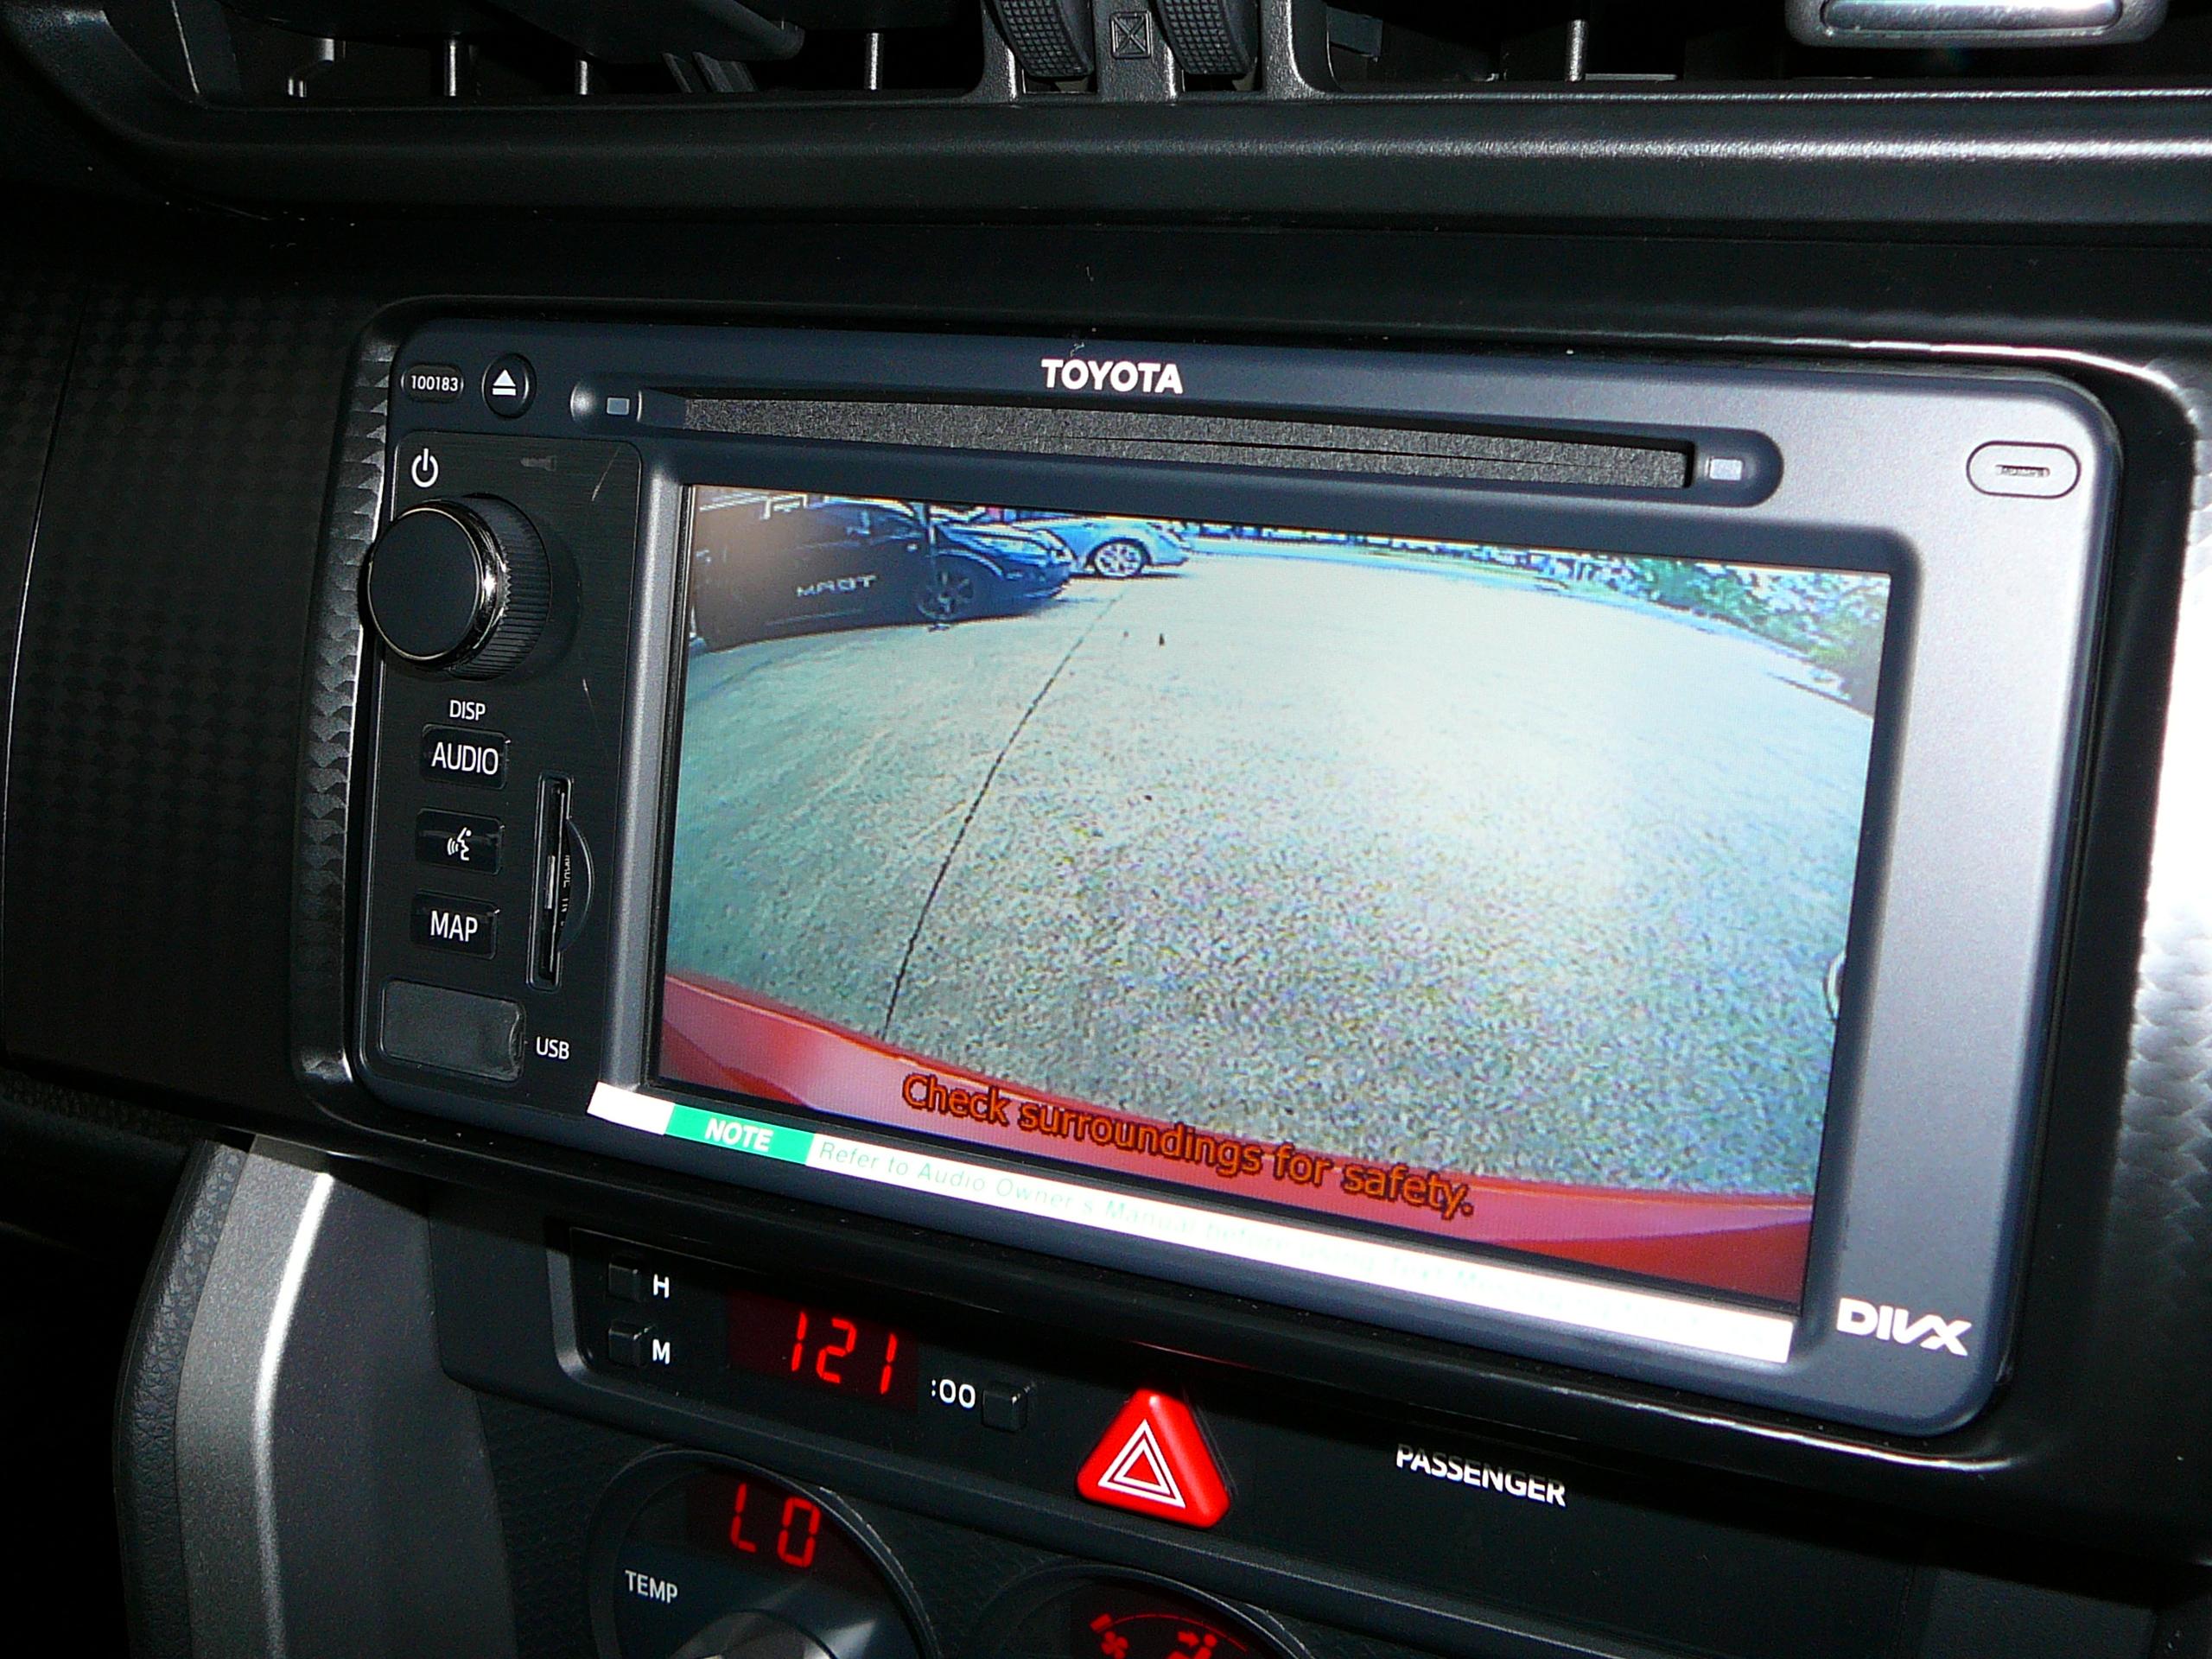 Toyota 86 GTS, Reverse Camera Installation using the Factory Toyota Screen